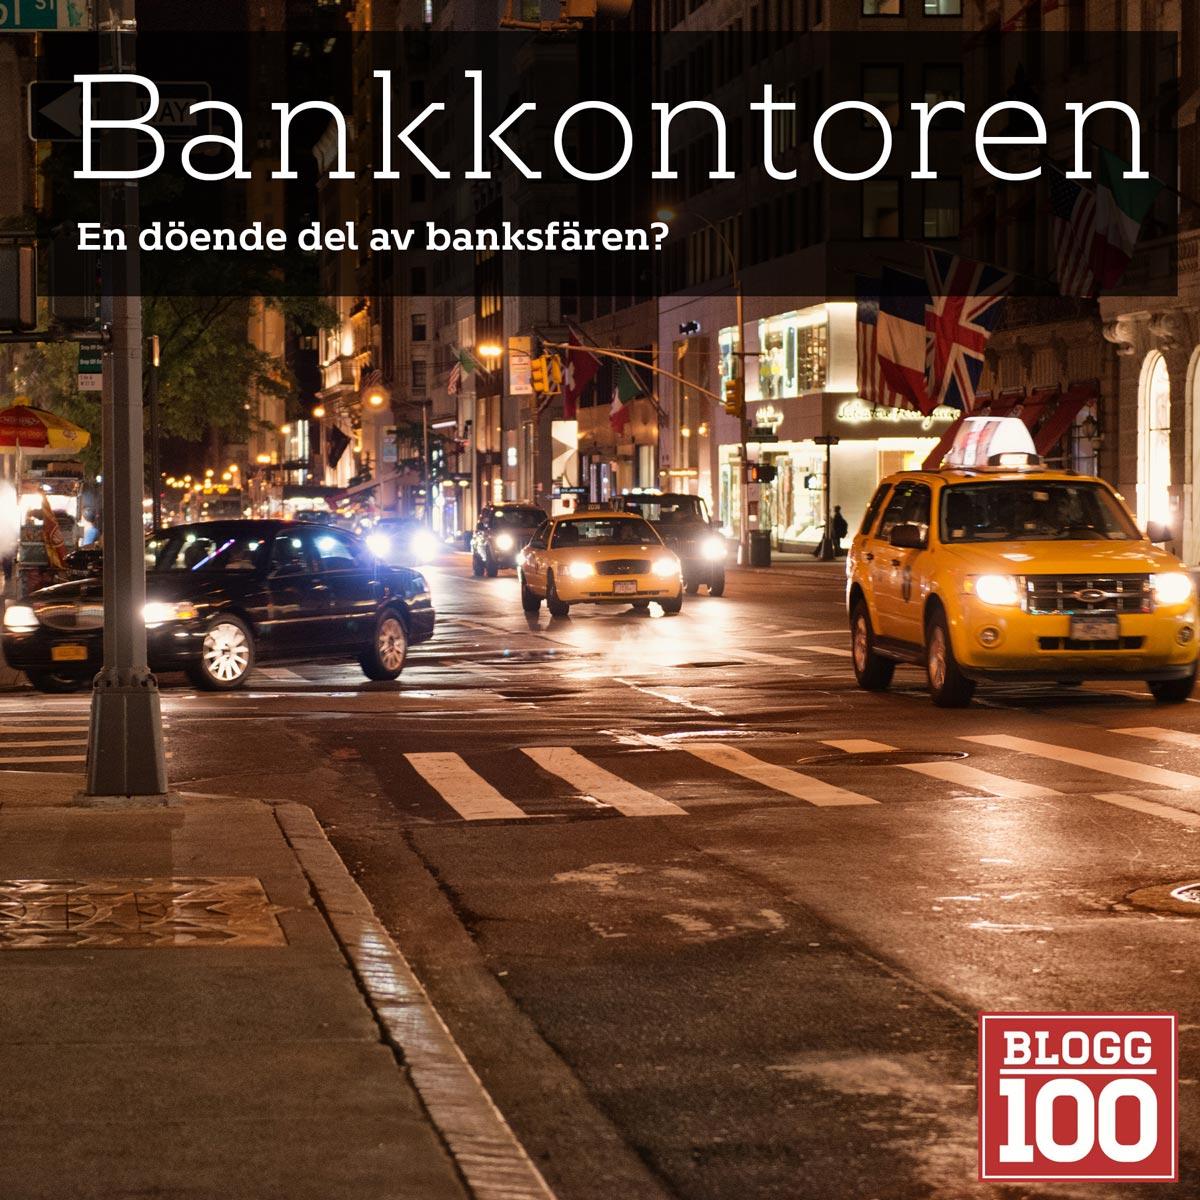 Bankkontoren en döende företeelse? #blogg100 #fb